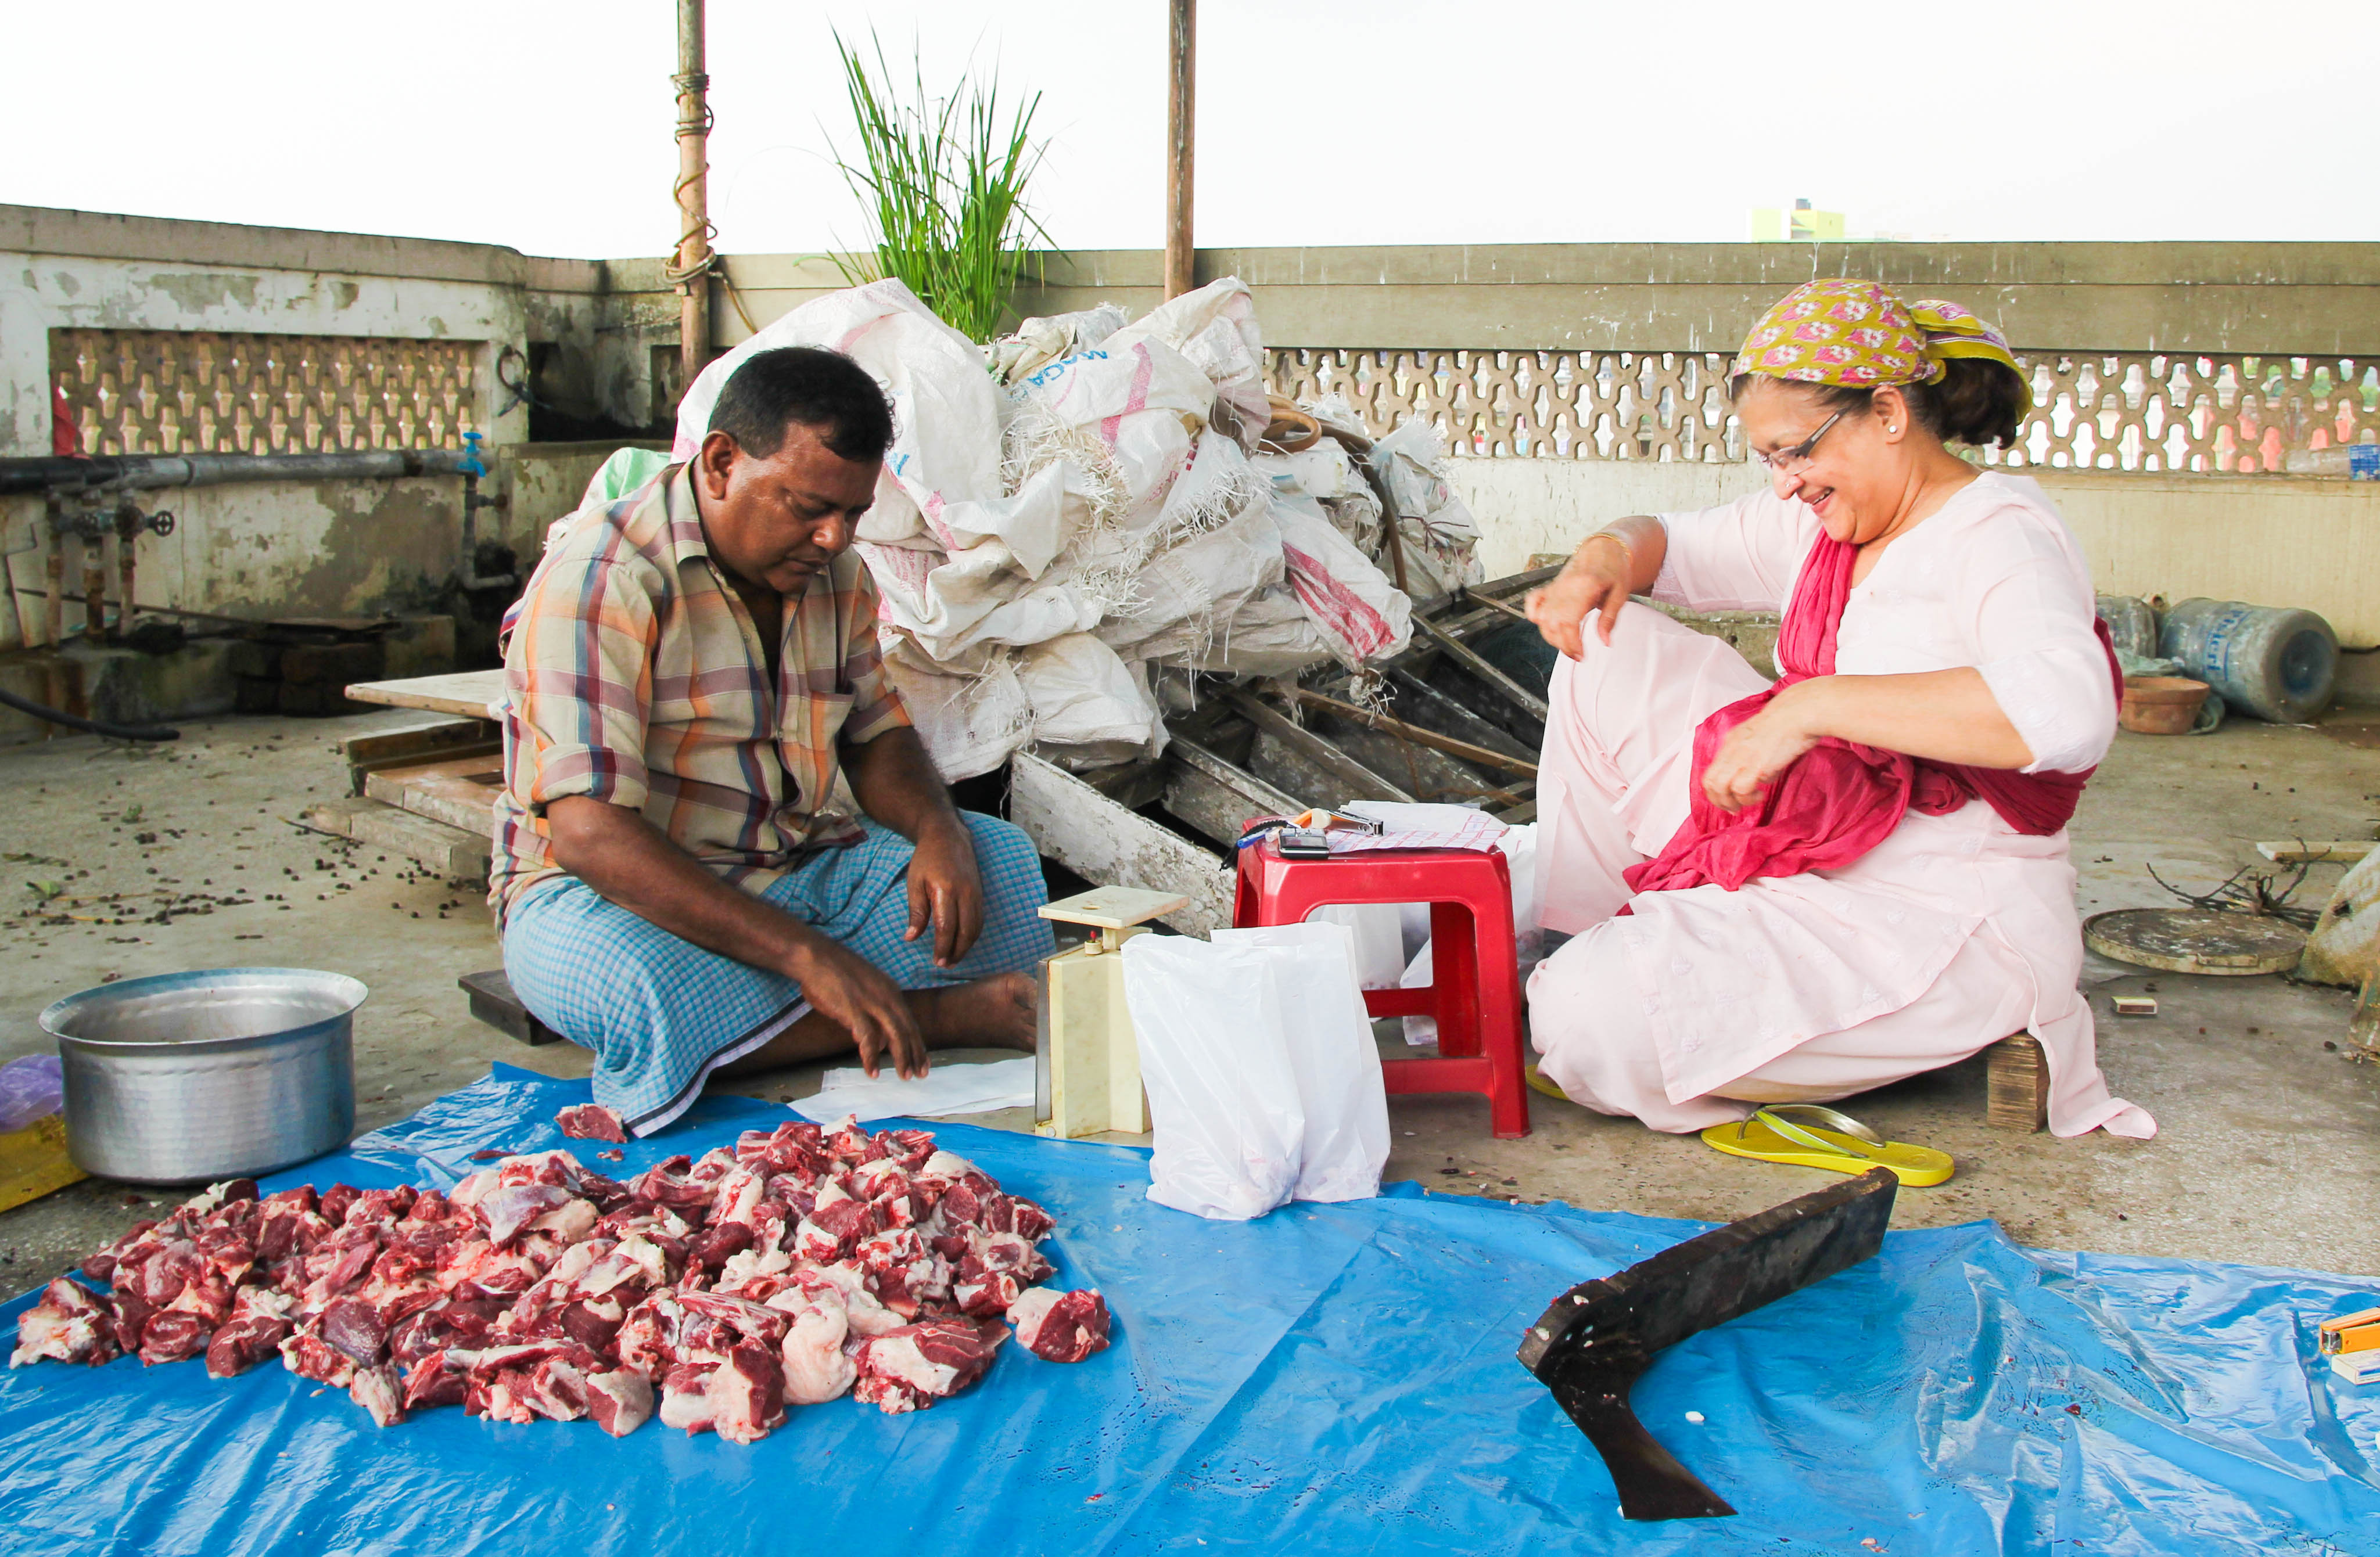 Dividing meat